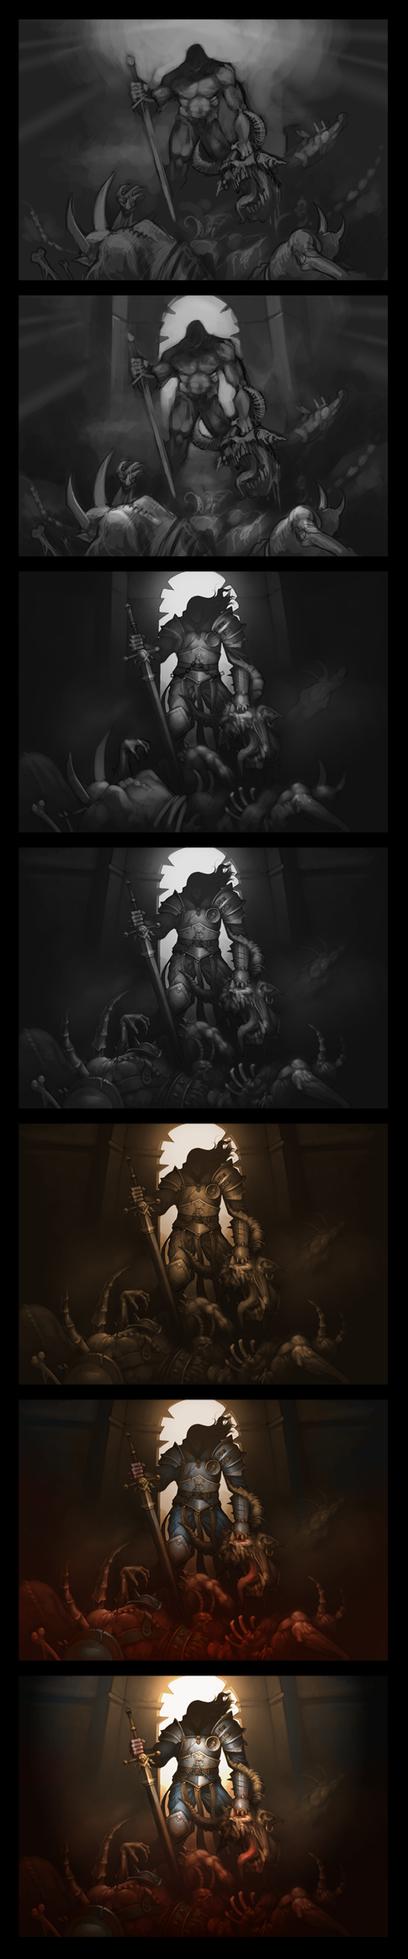 Demon Hunter Wip by Gimaldinov